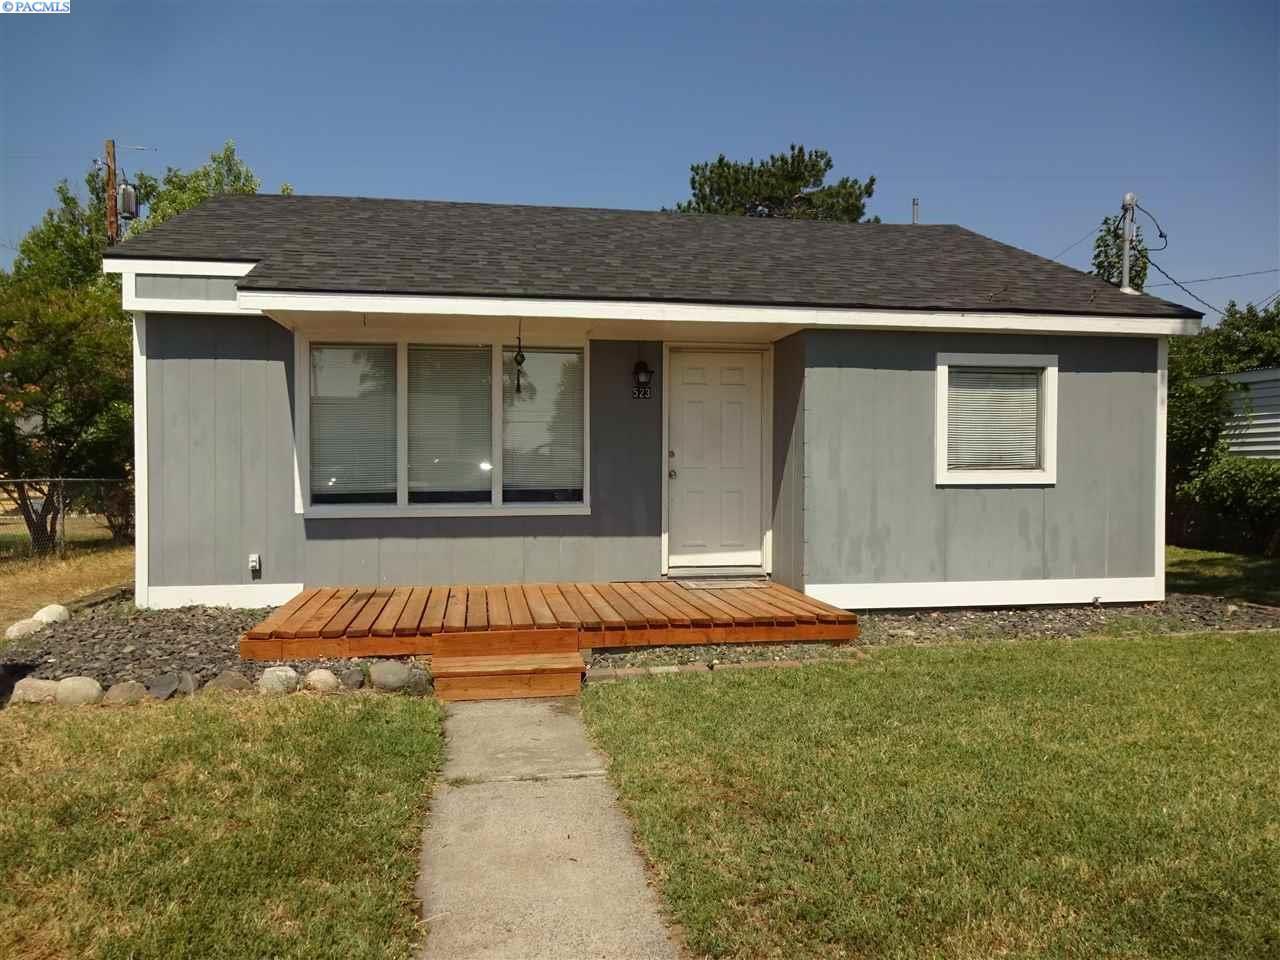 523 Smith Ave., Richland, WA 99352 - #: 246783